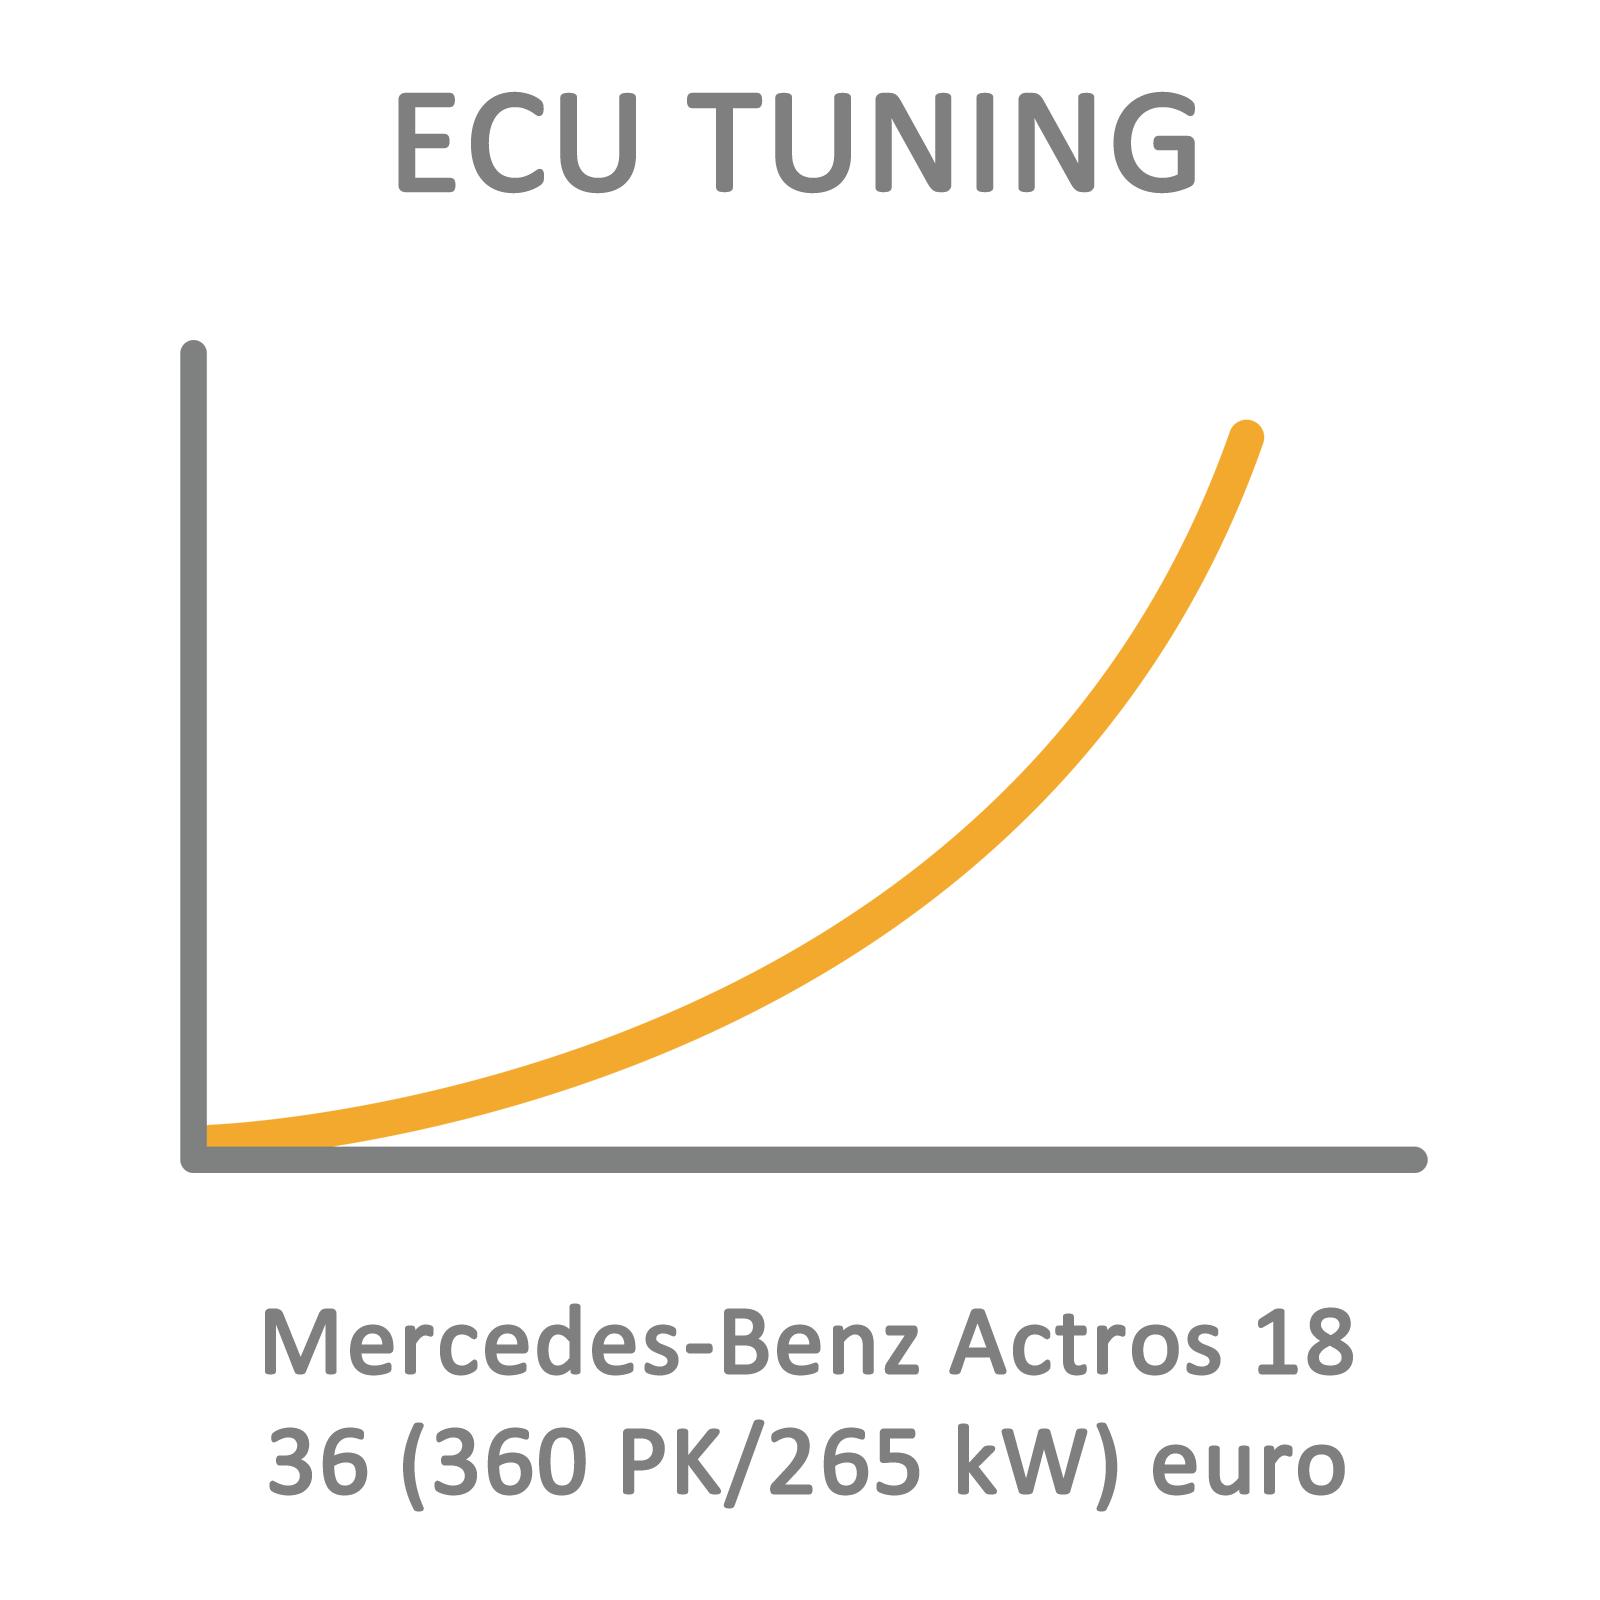 Mercedes-Benz Actros 18 36 (360 PK/265 kW) euro 3+4+5 ECU